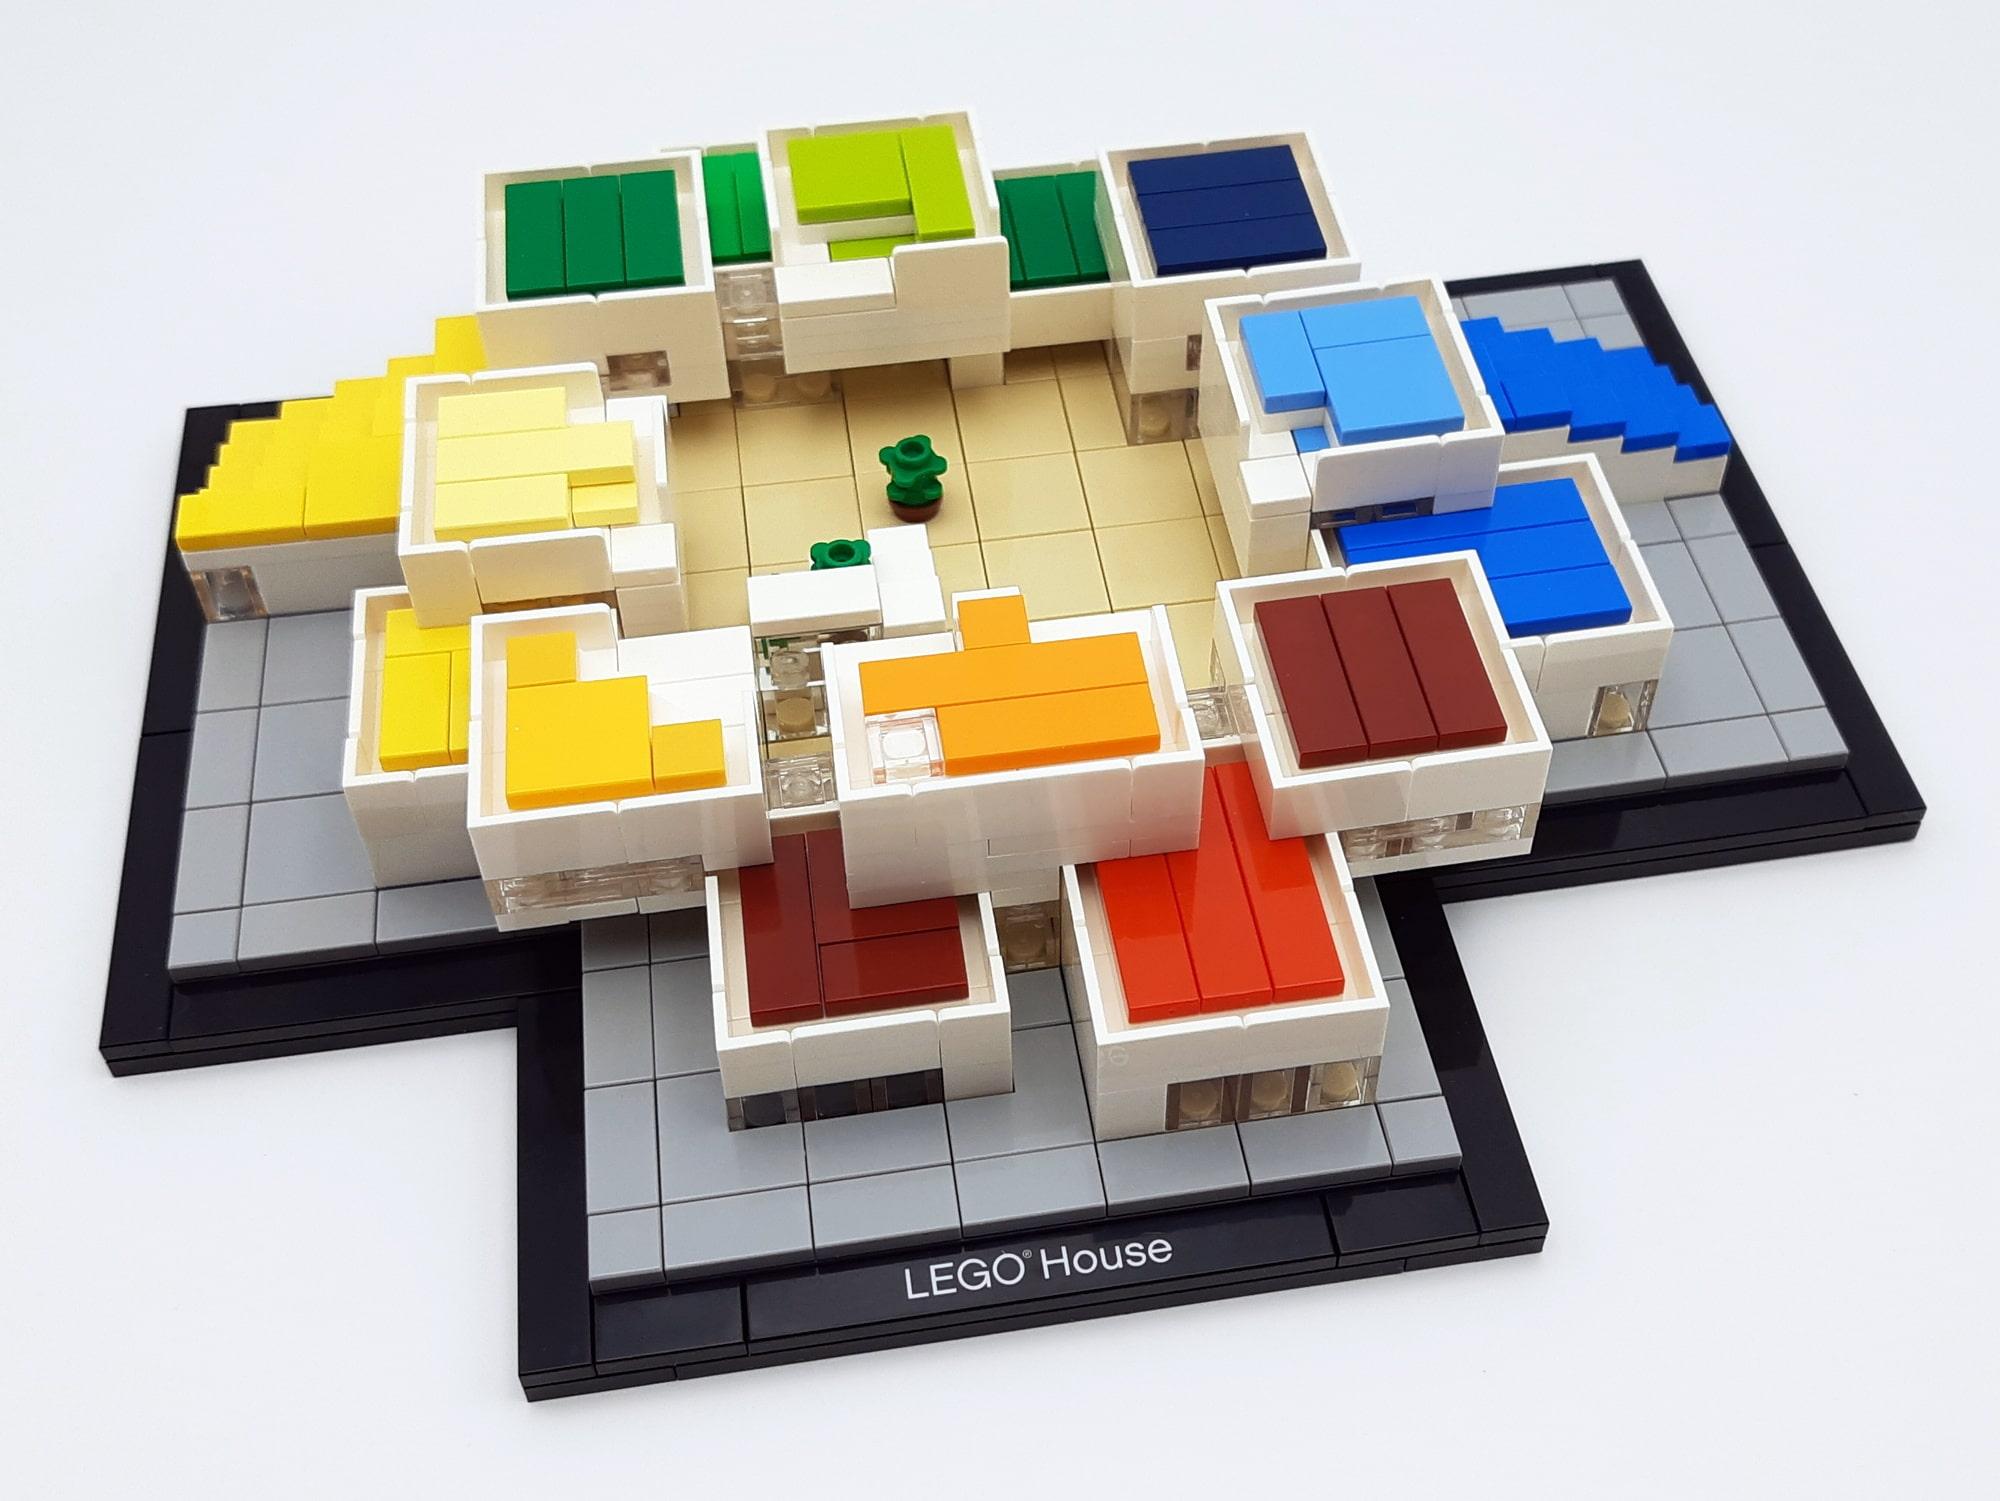 LEGO 21037 - LEGO House Baubschnitt halber Stock